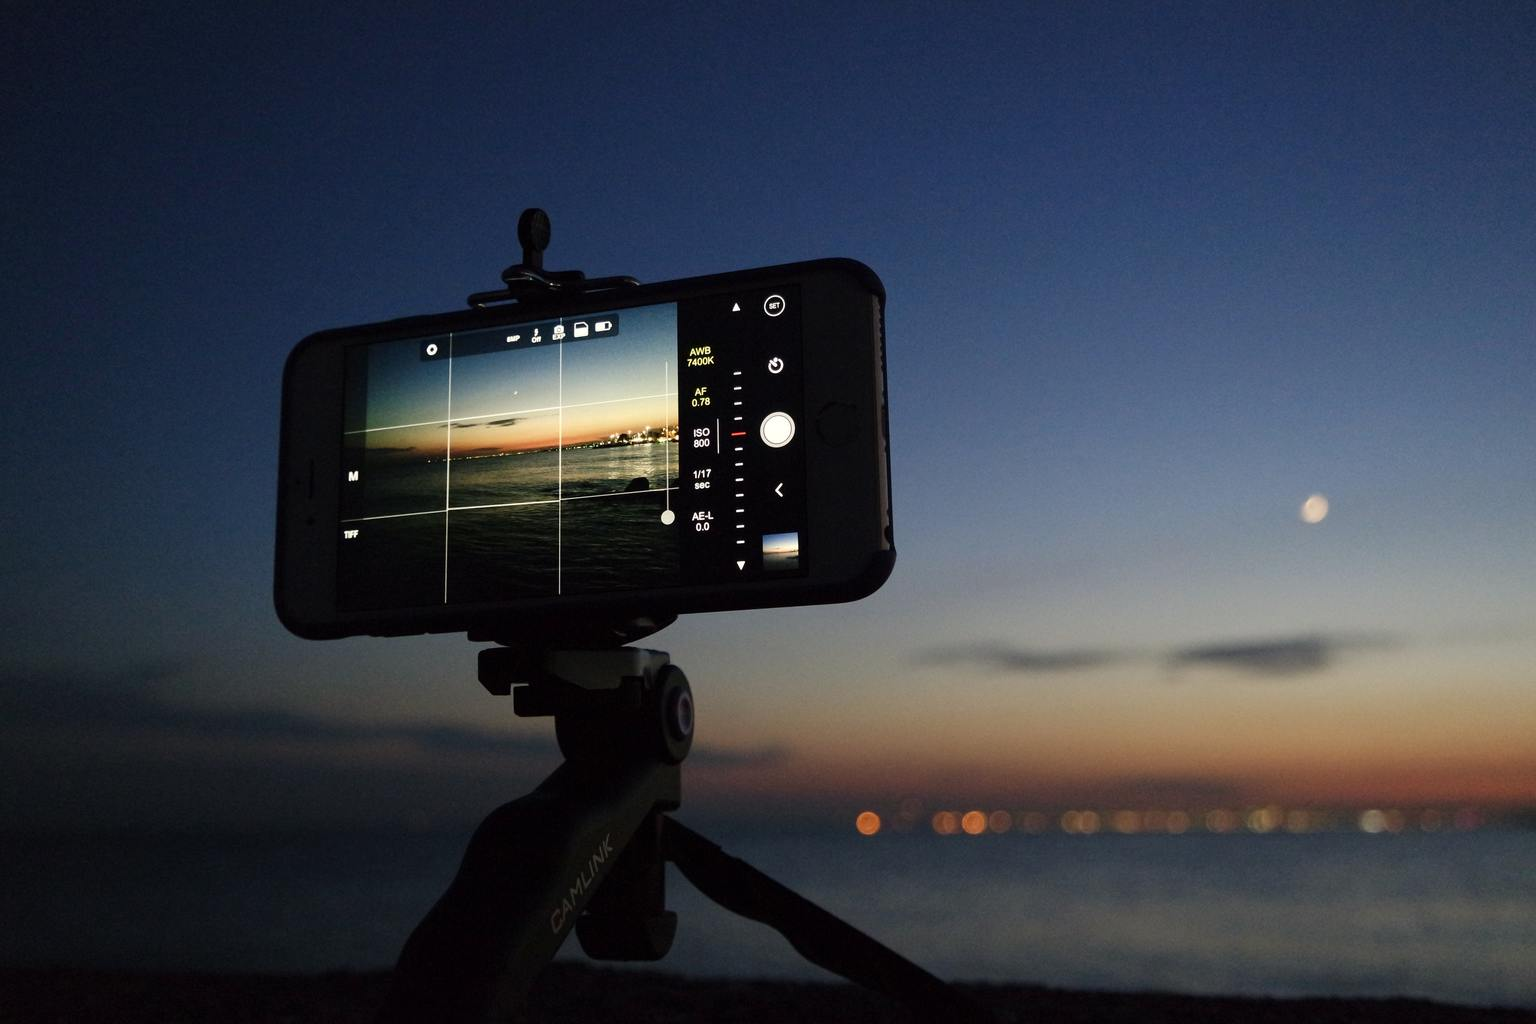 móvil foto nocturna